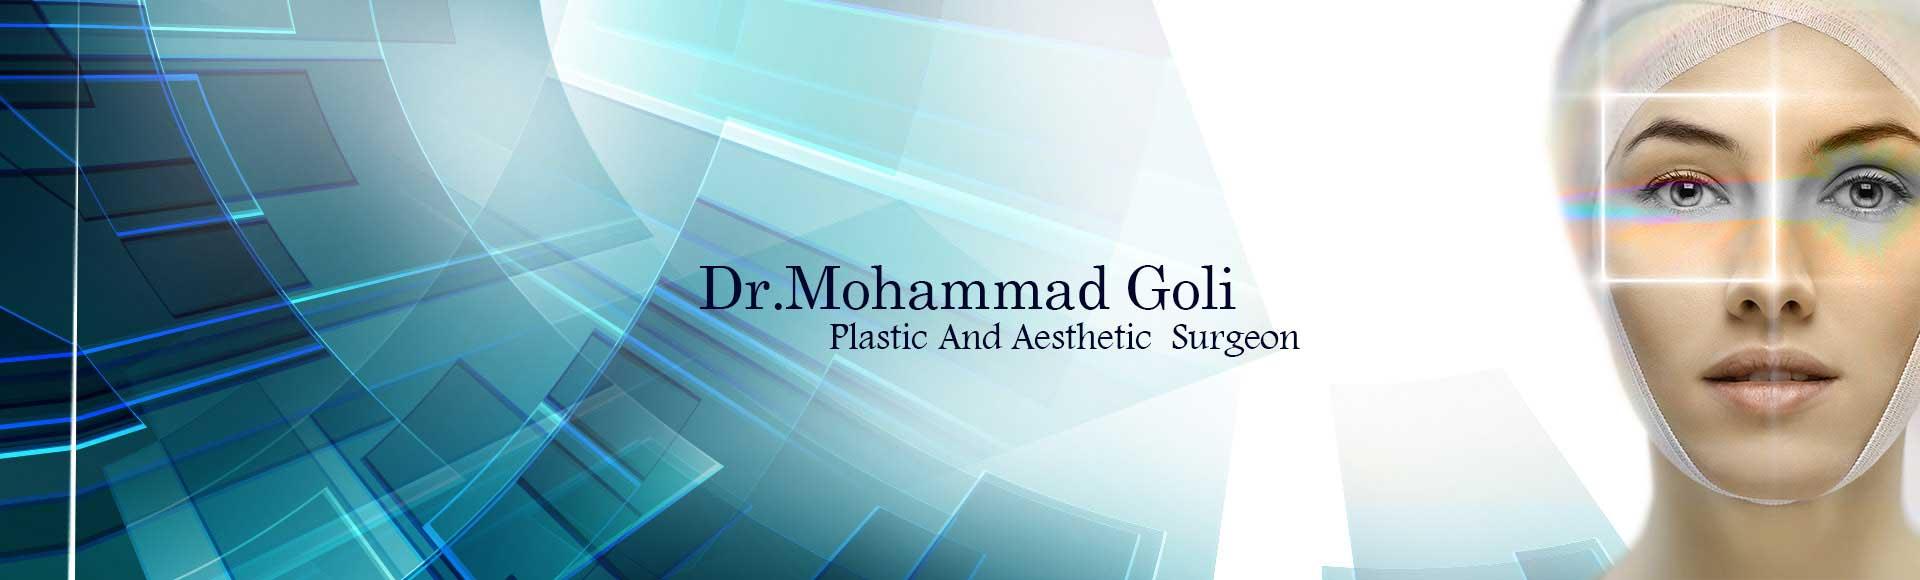 nose-surgery-drgoli-slide